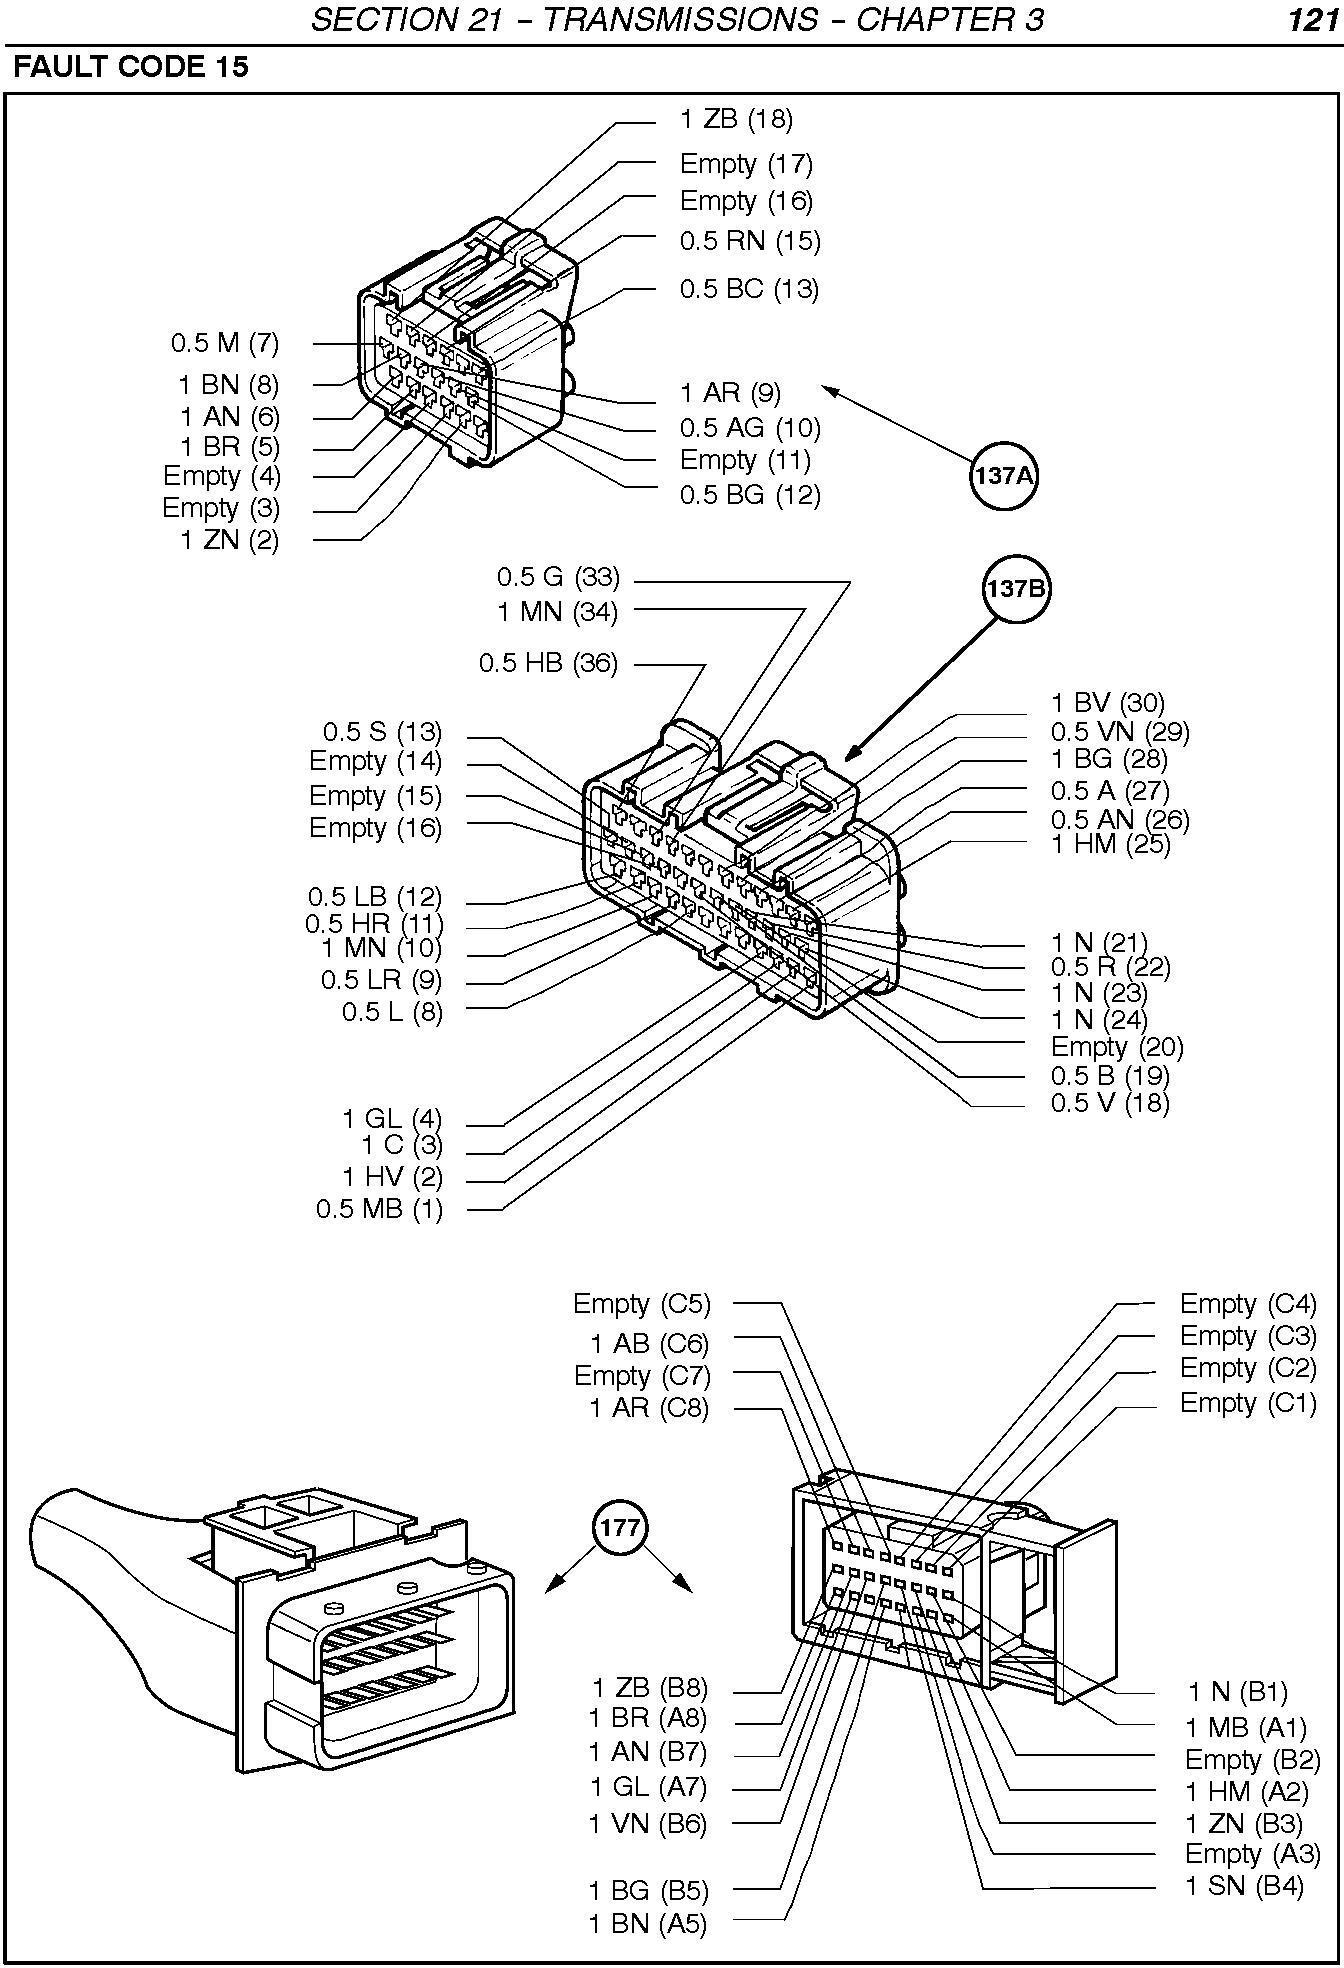 New Holland TN60A, TN70A, TN75A, TN85A, TN95A Tractors Complete Service Manual - 3